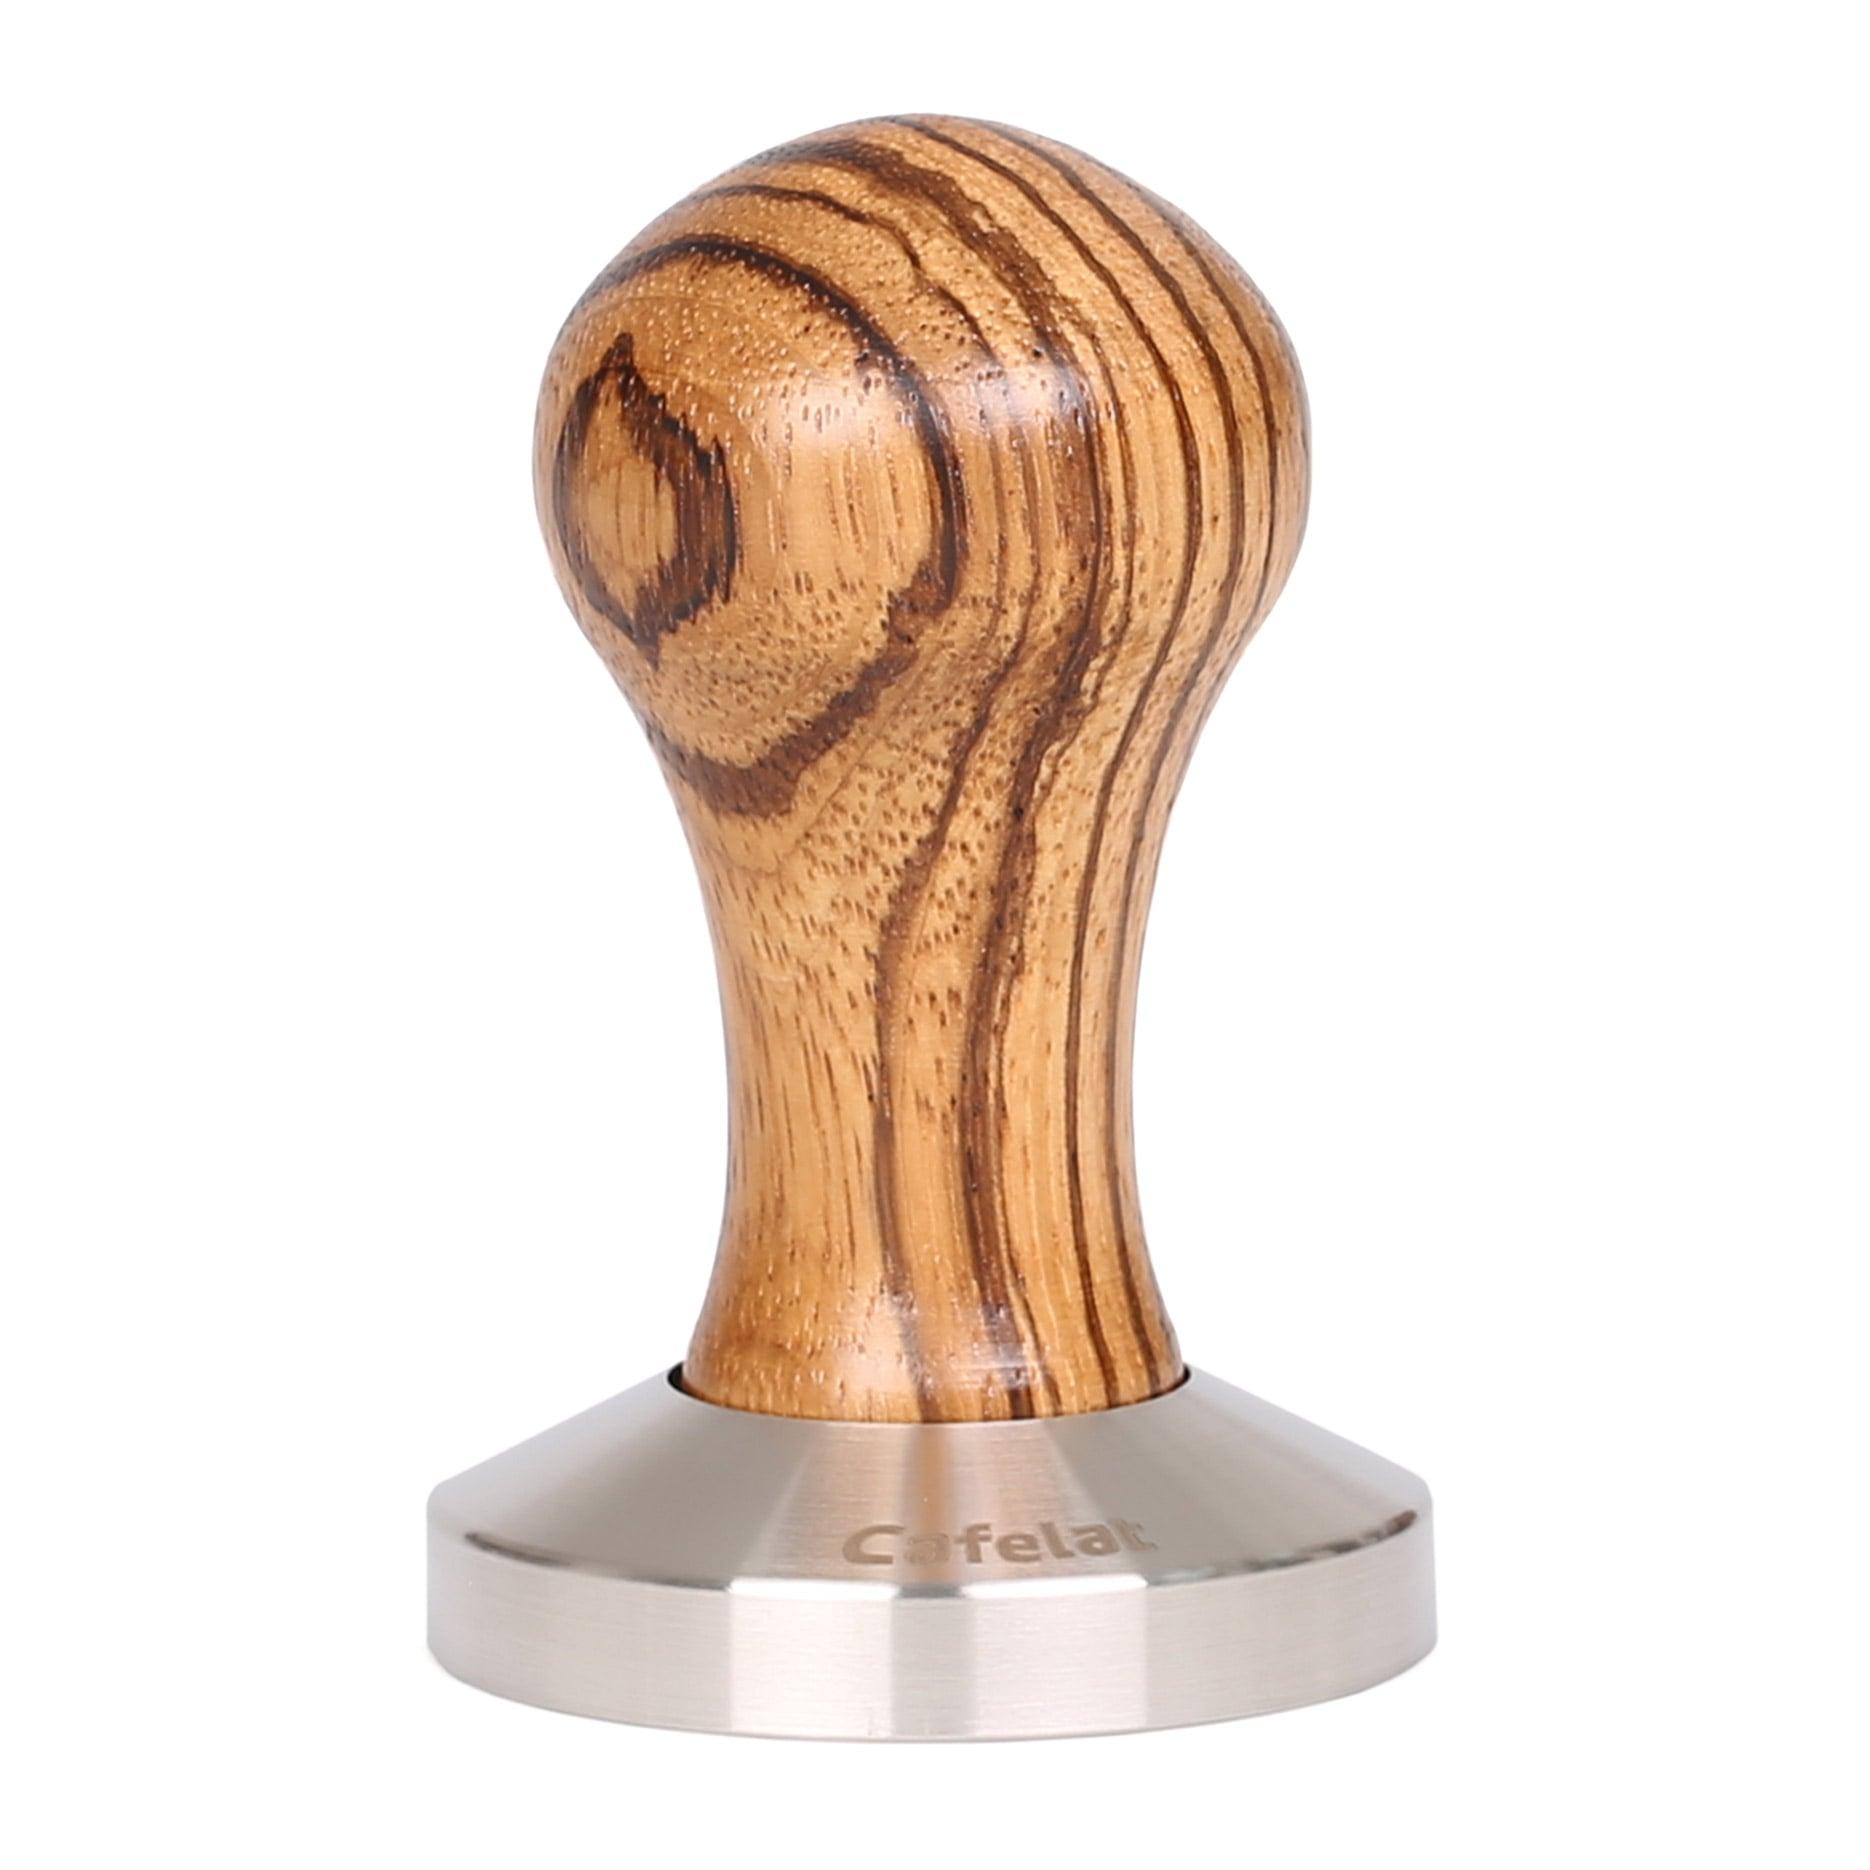 Espresso Coffee Tamper 58mm Flat Base Hande made Zebrano Wood